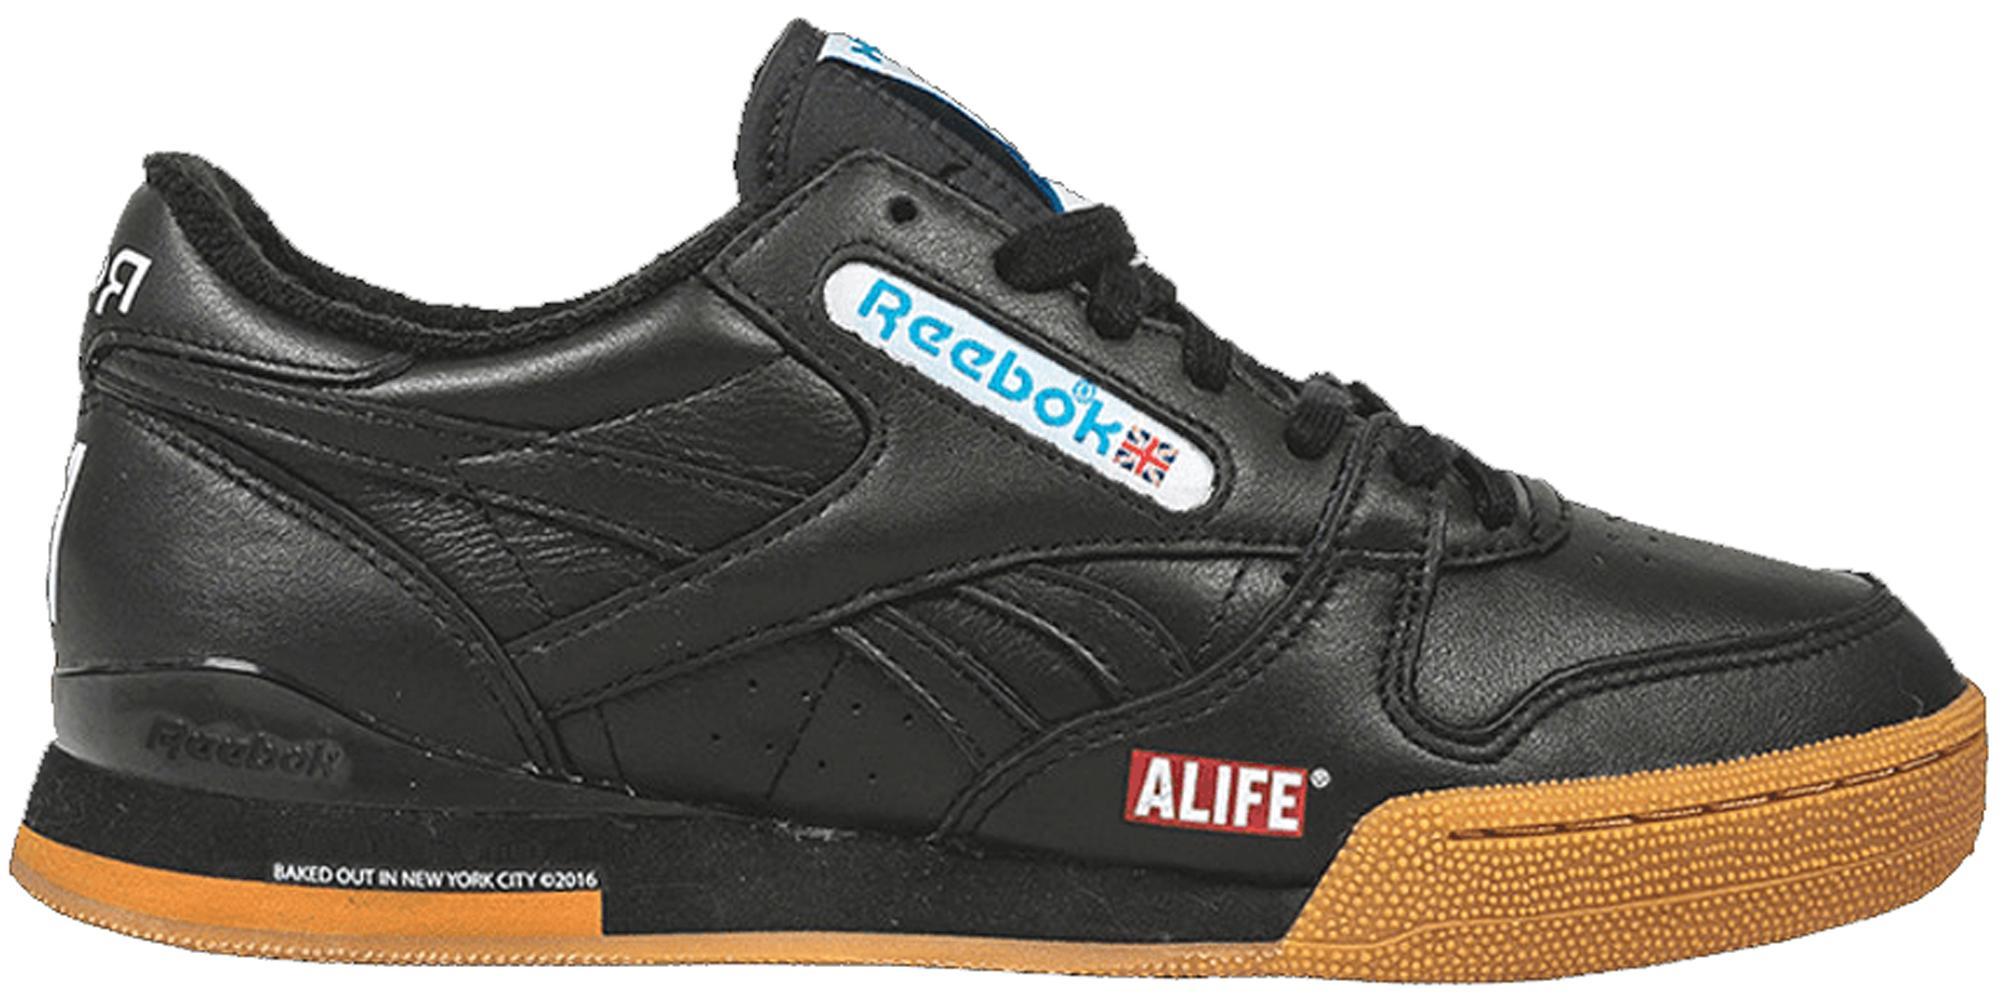 Reebok Phase 1 Pro Alife Black - BS7123